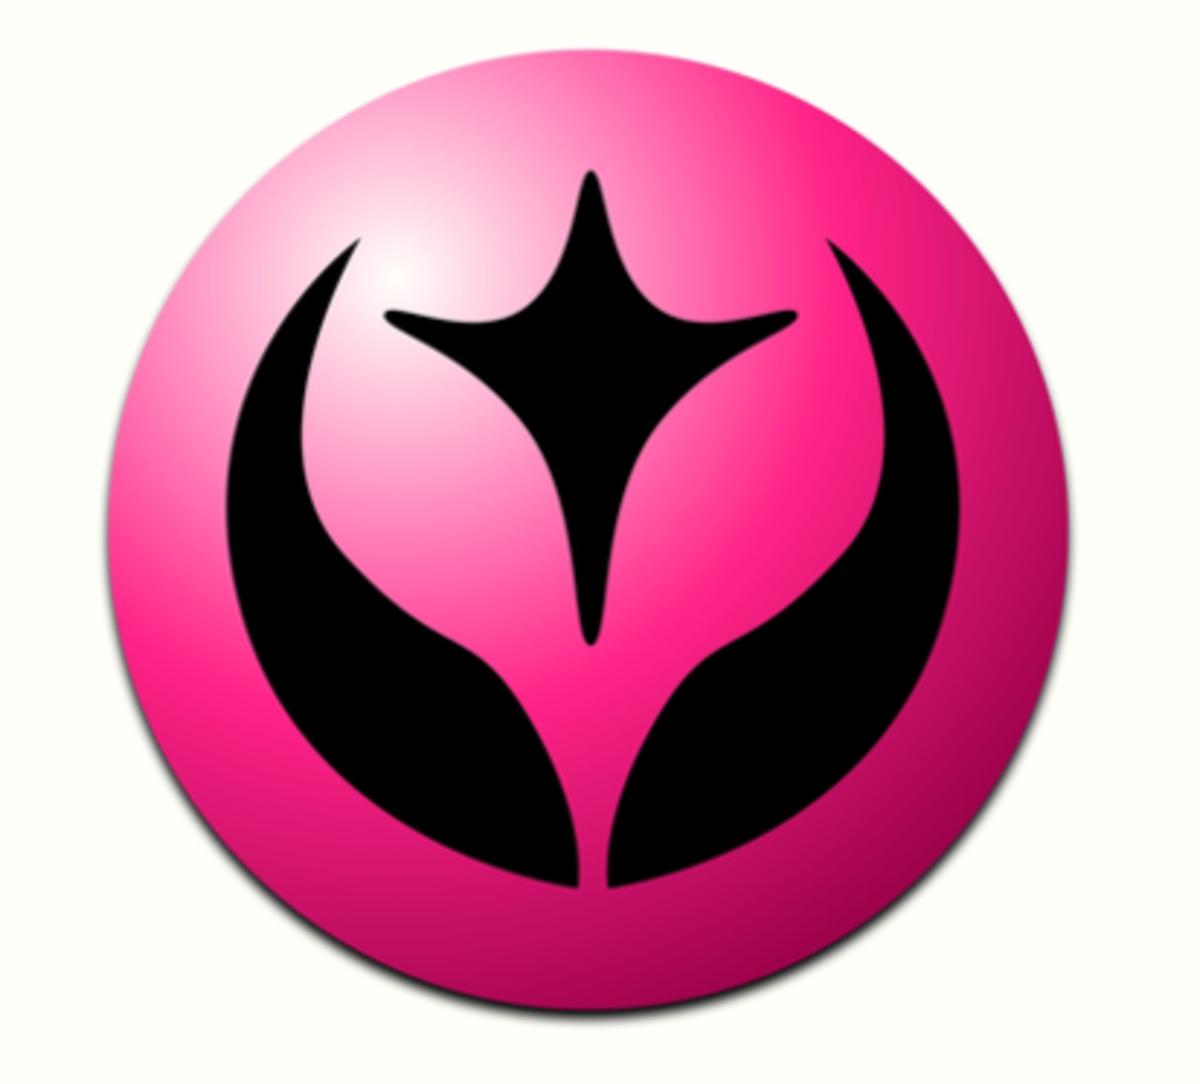 Fairy Pokémon logo